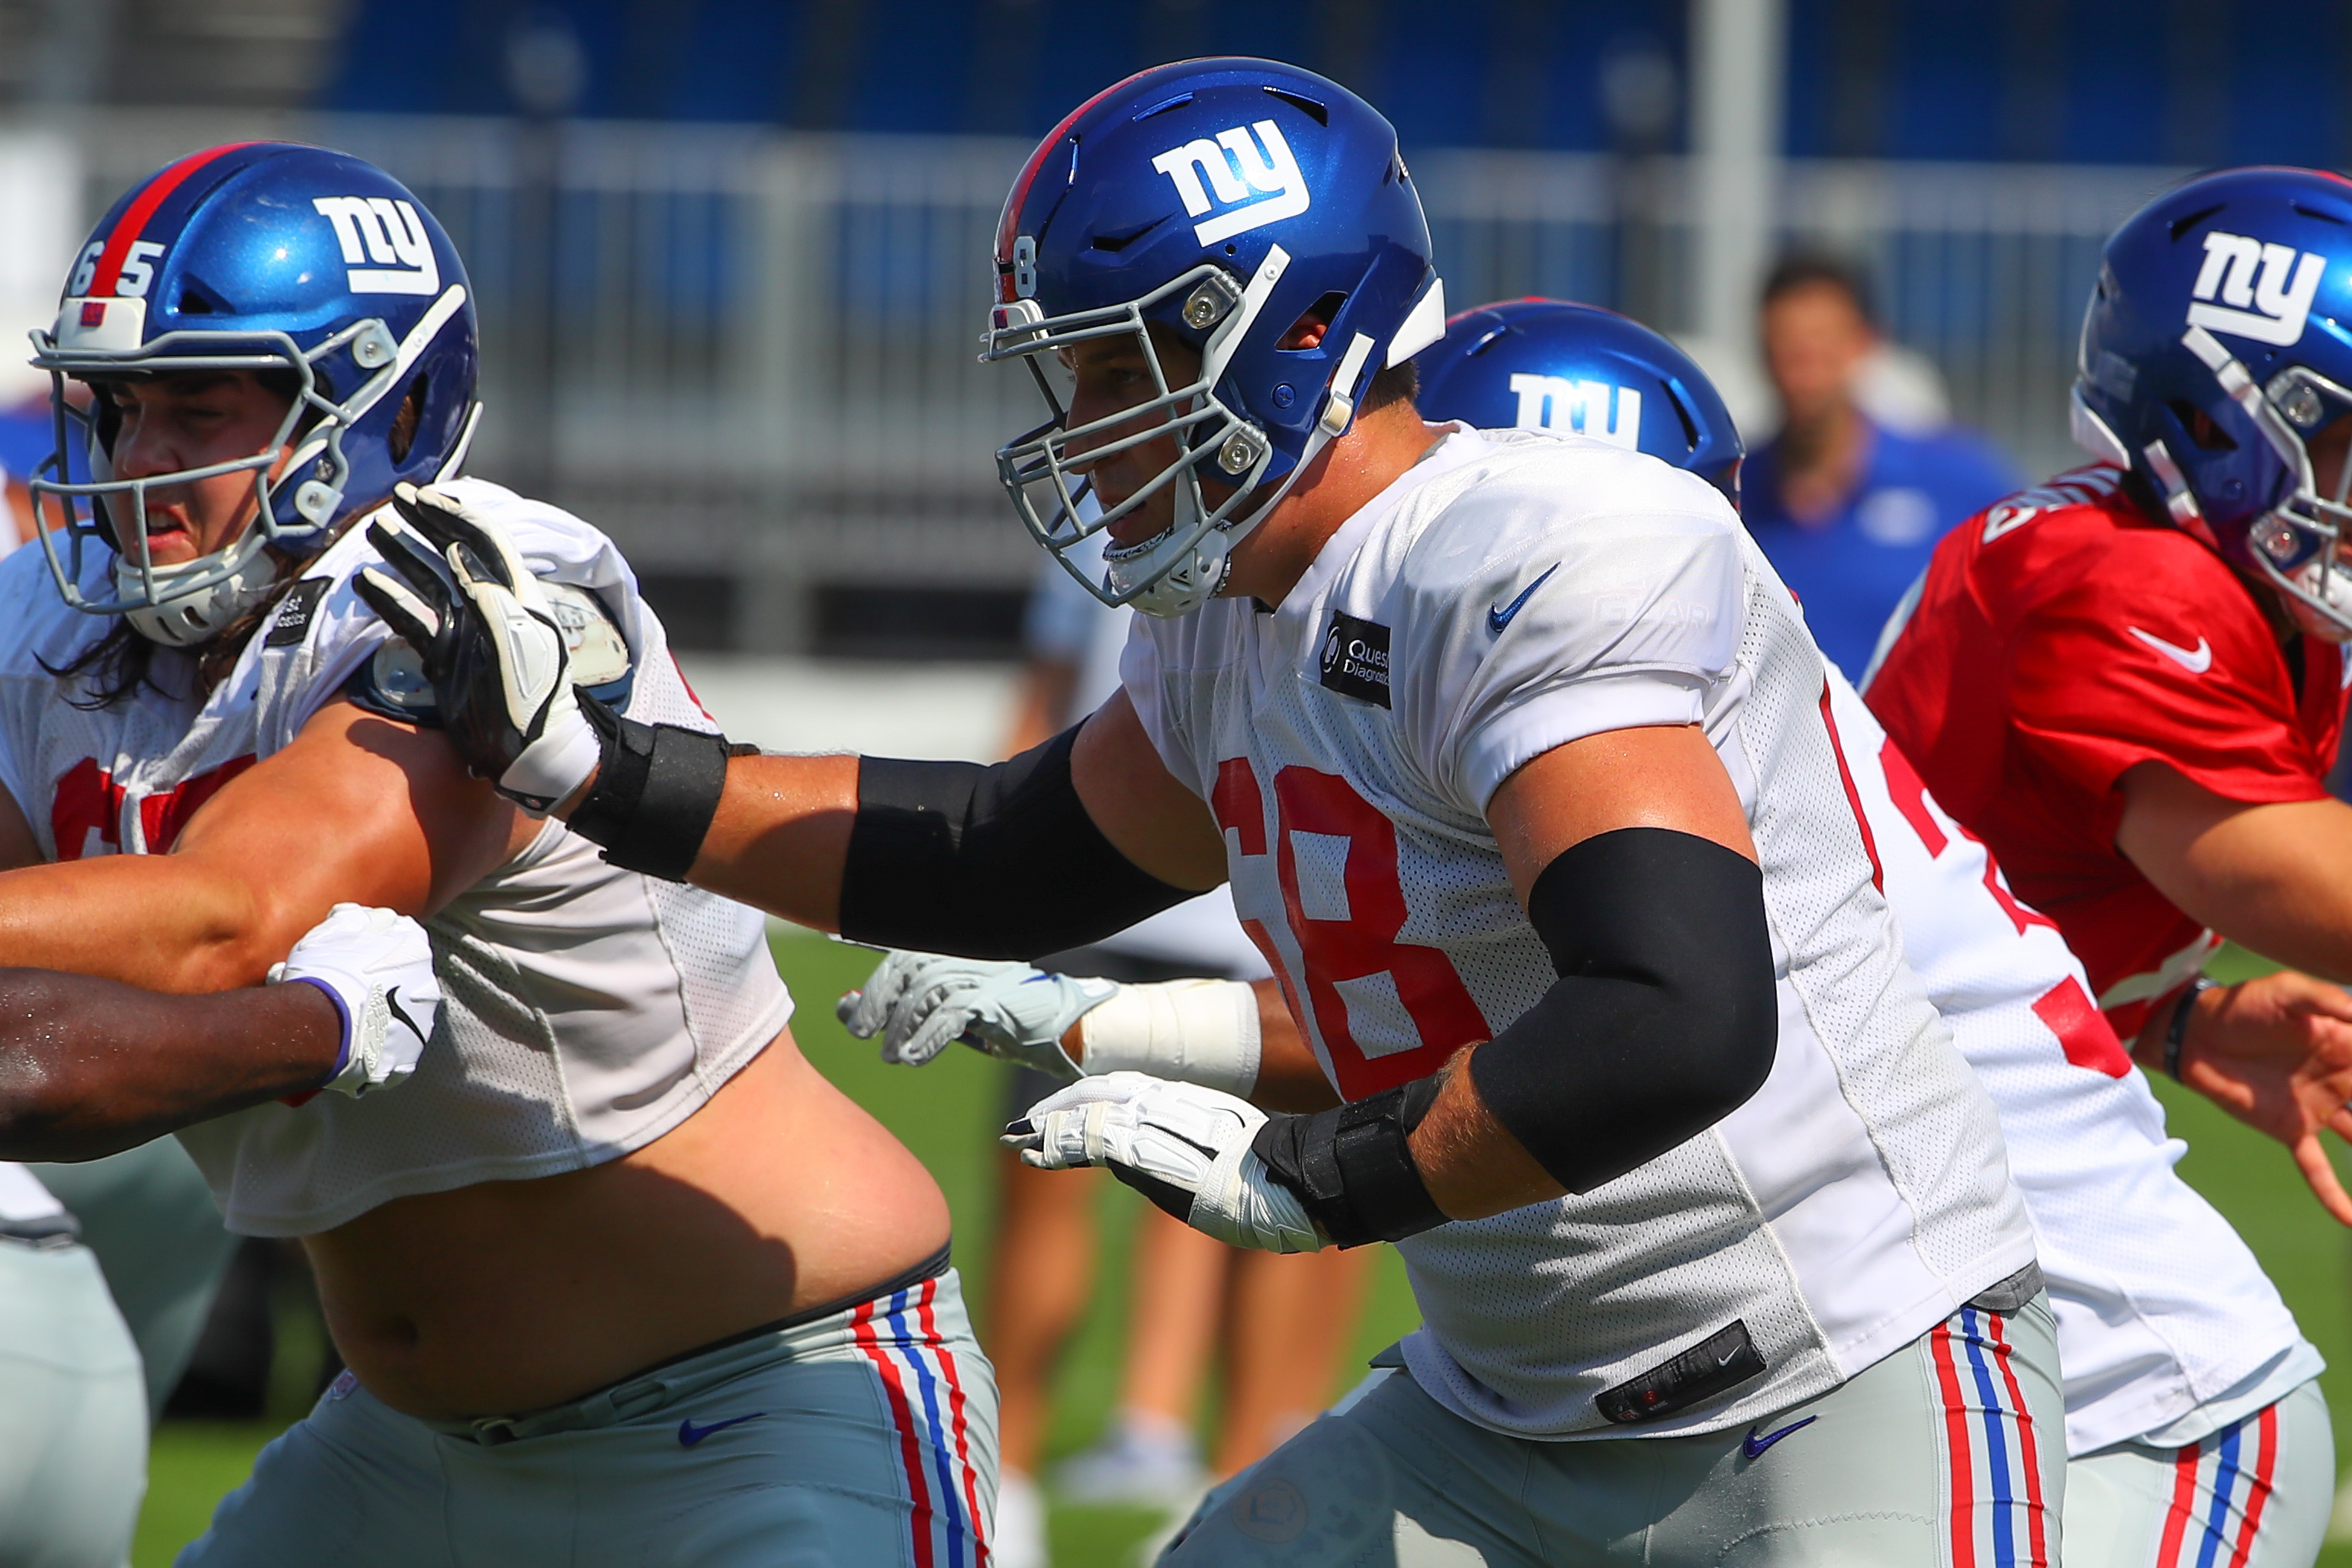 NFL: AUG 03 Giants Training Camp